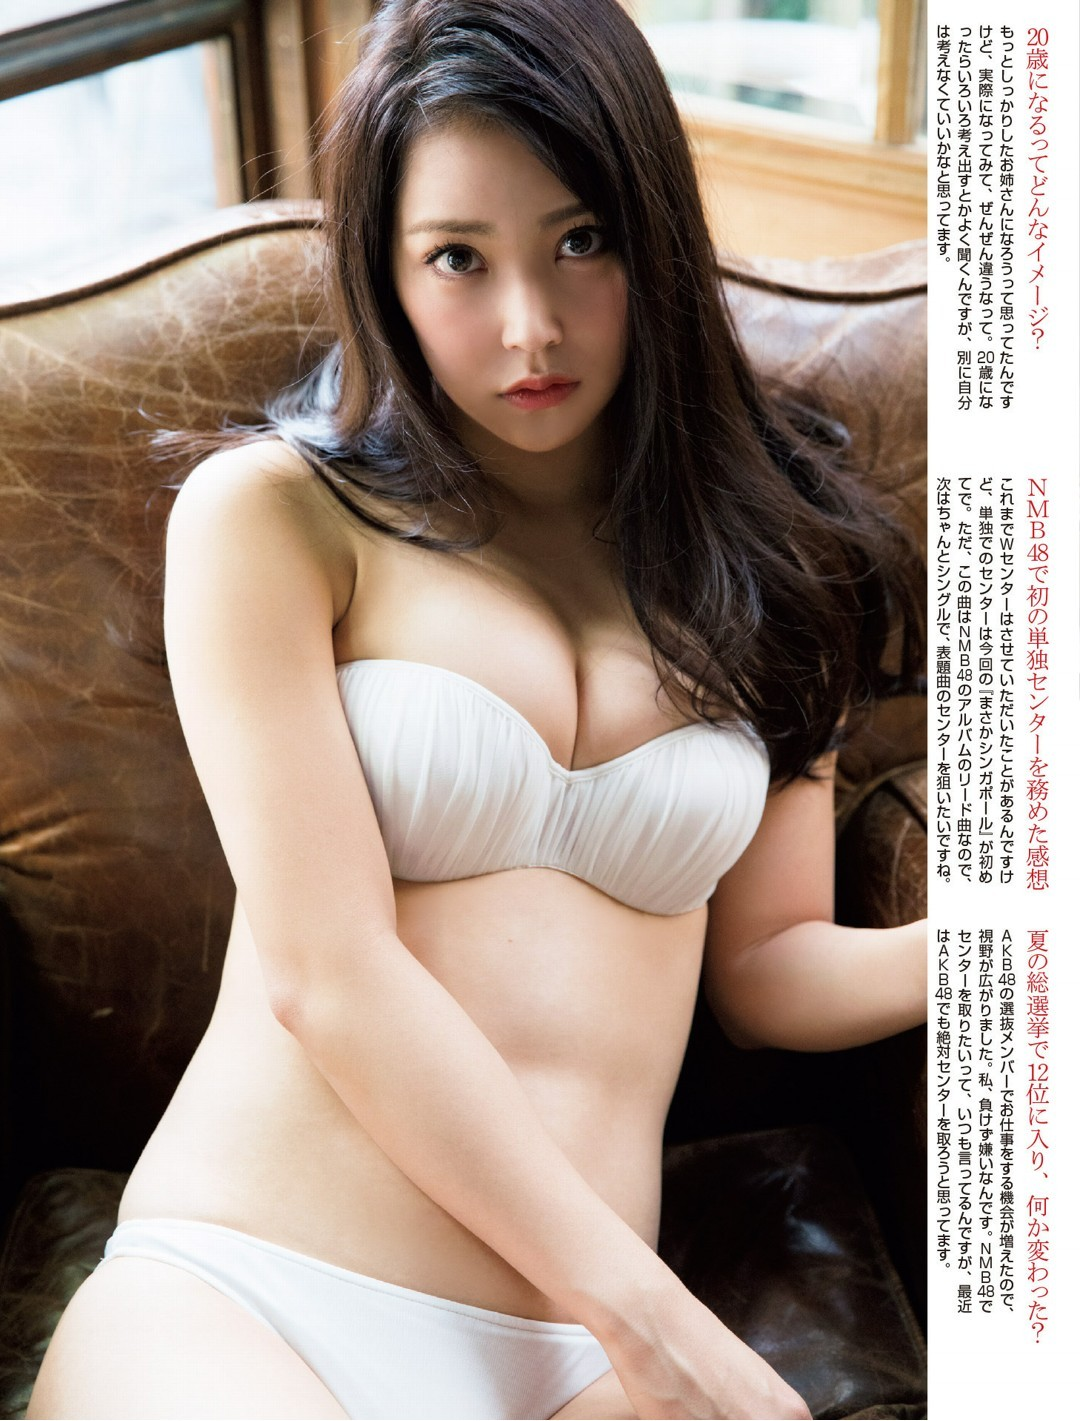 NMB48白間美瑠&太田夢莉のWグラビアエロ画像150枚・35枚目の画像